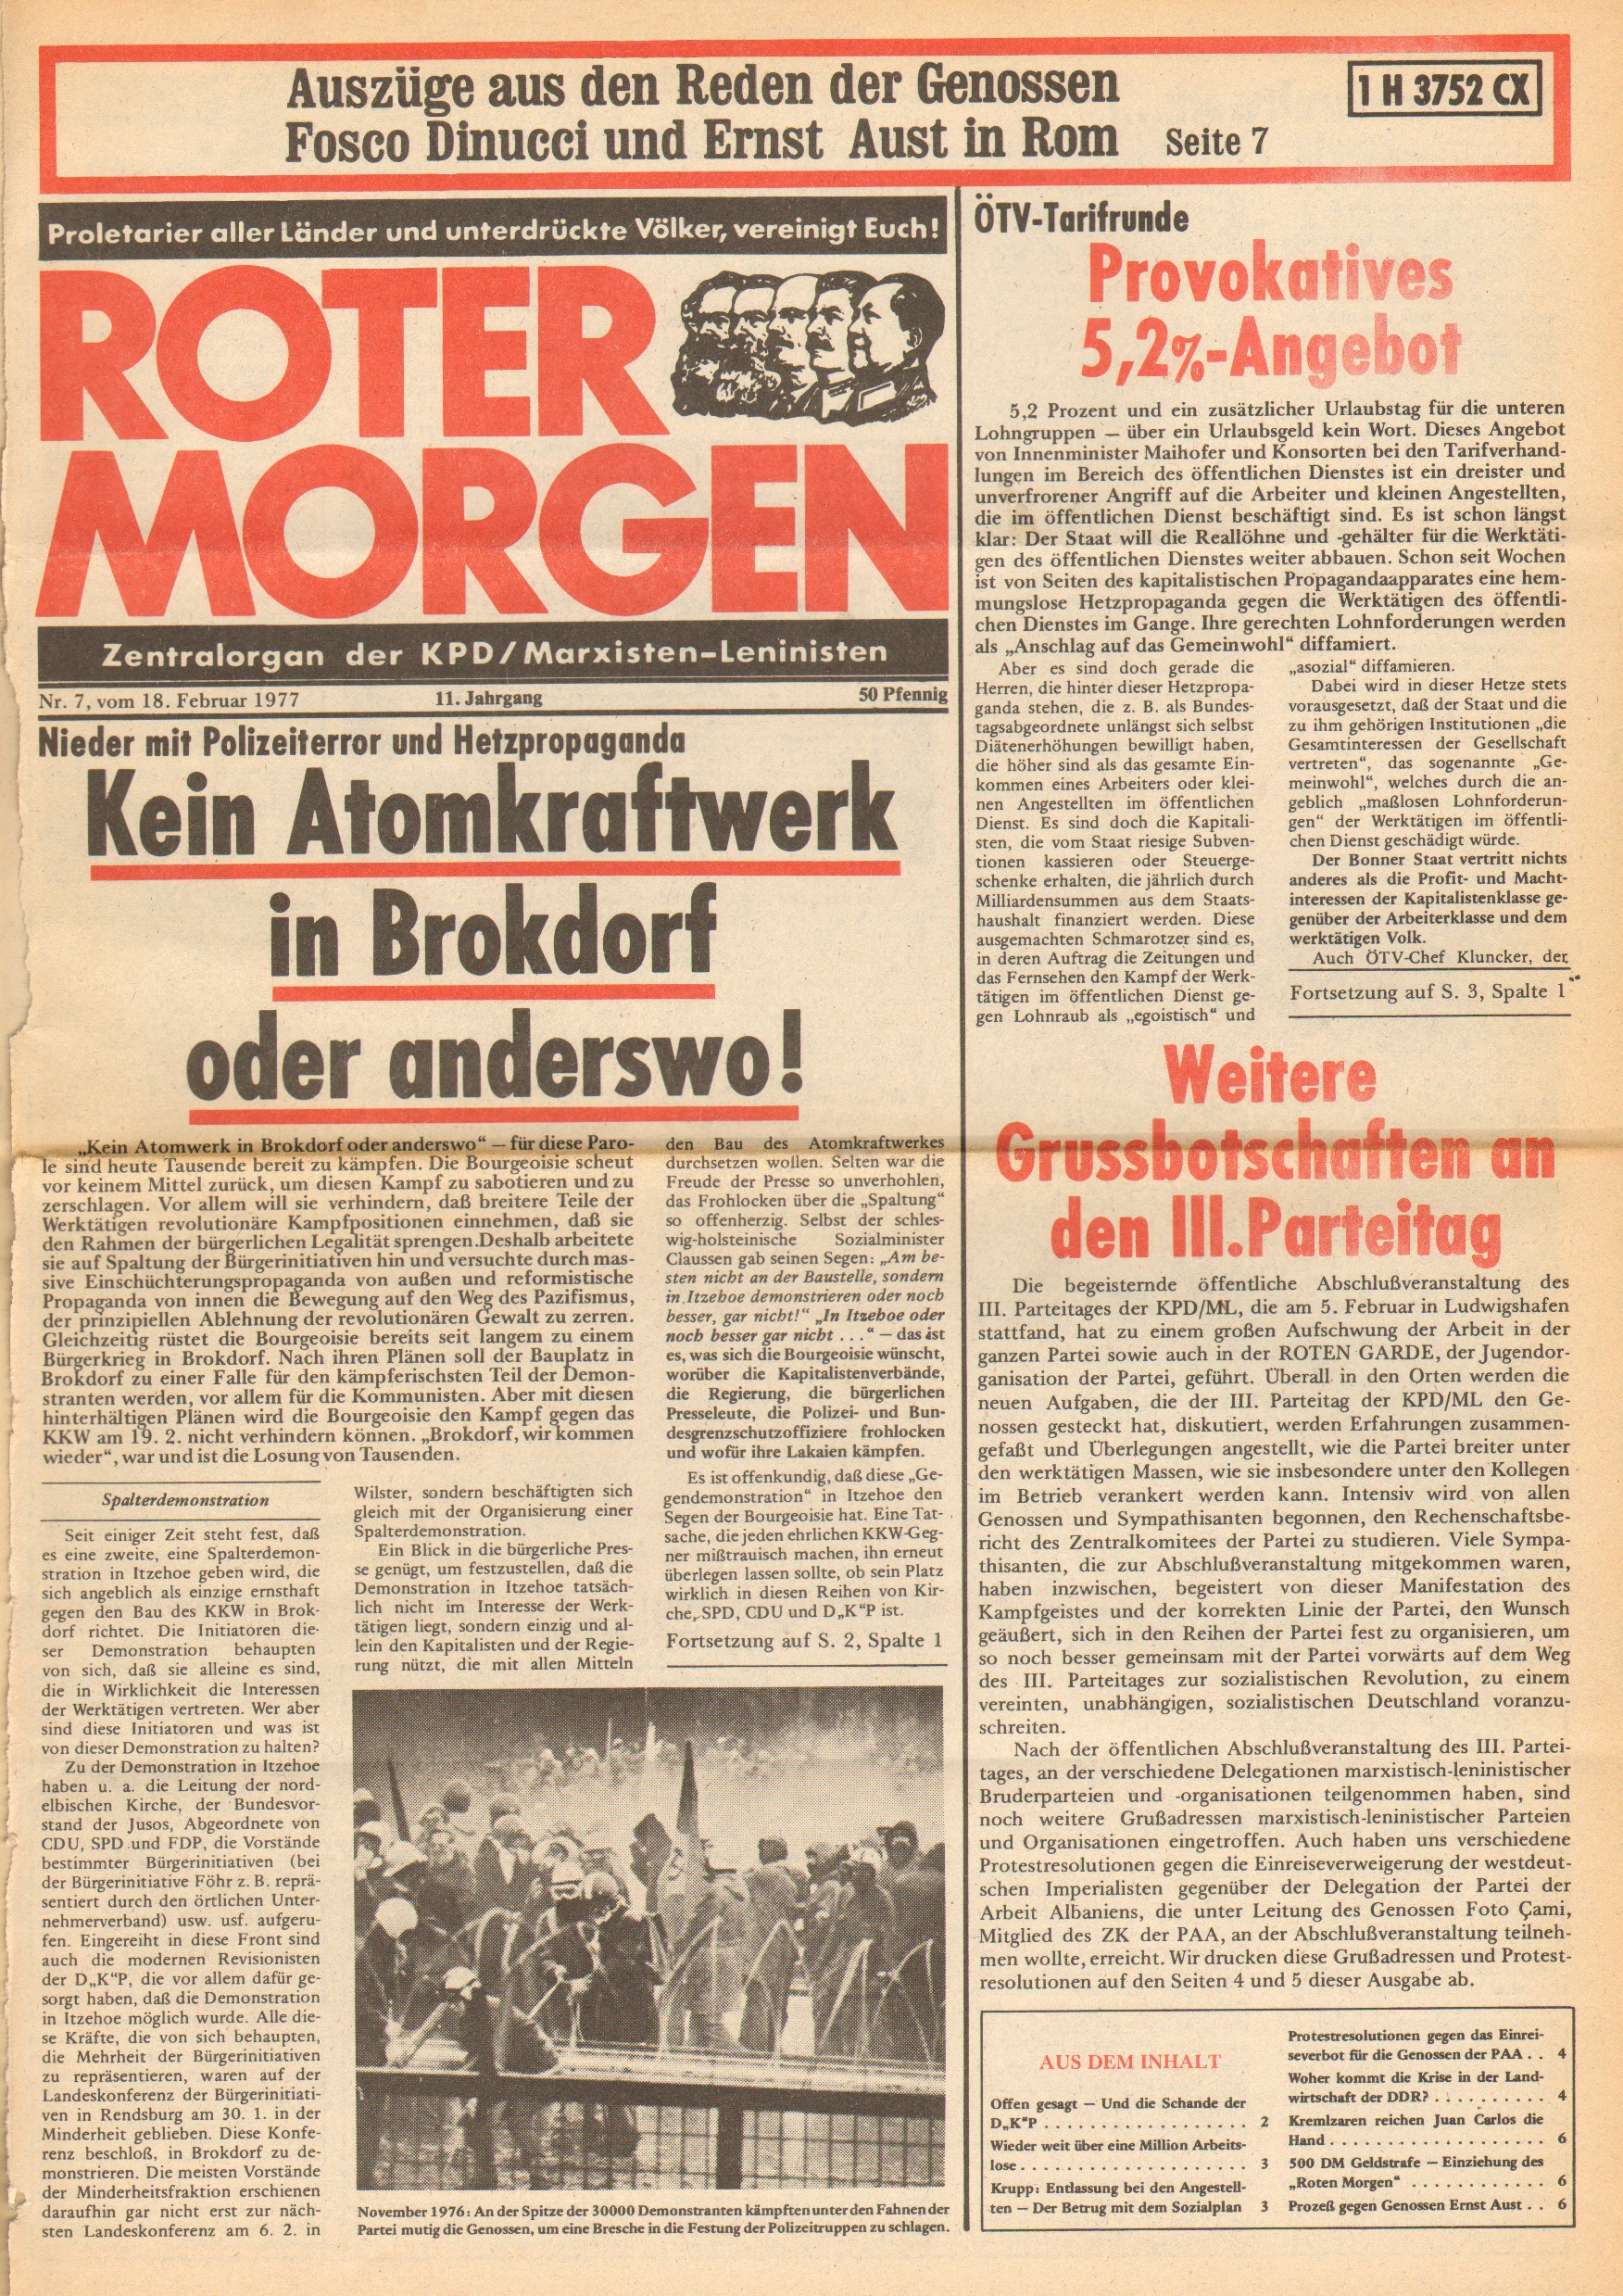 Roter Morgen, 11. Jg., 18. Februar 1977, Nr. 7, Seite 1